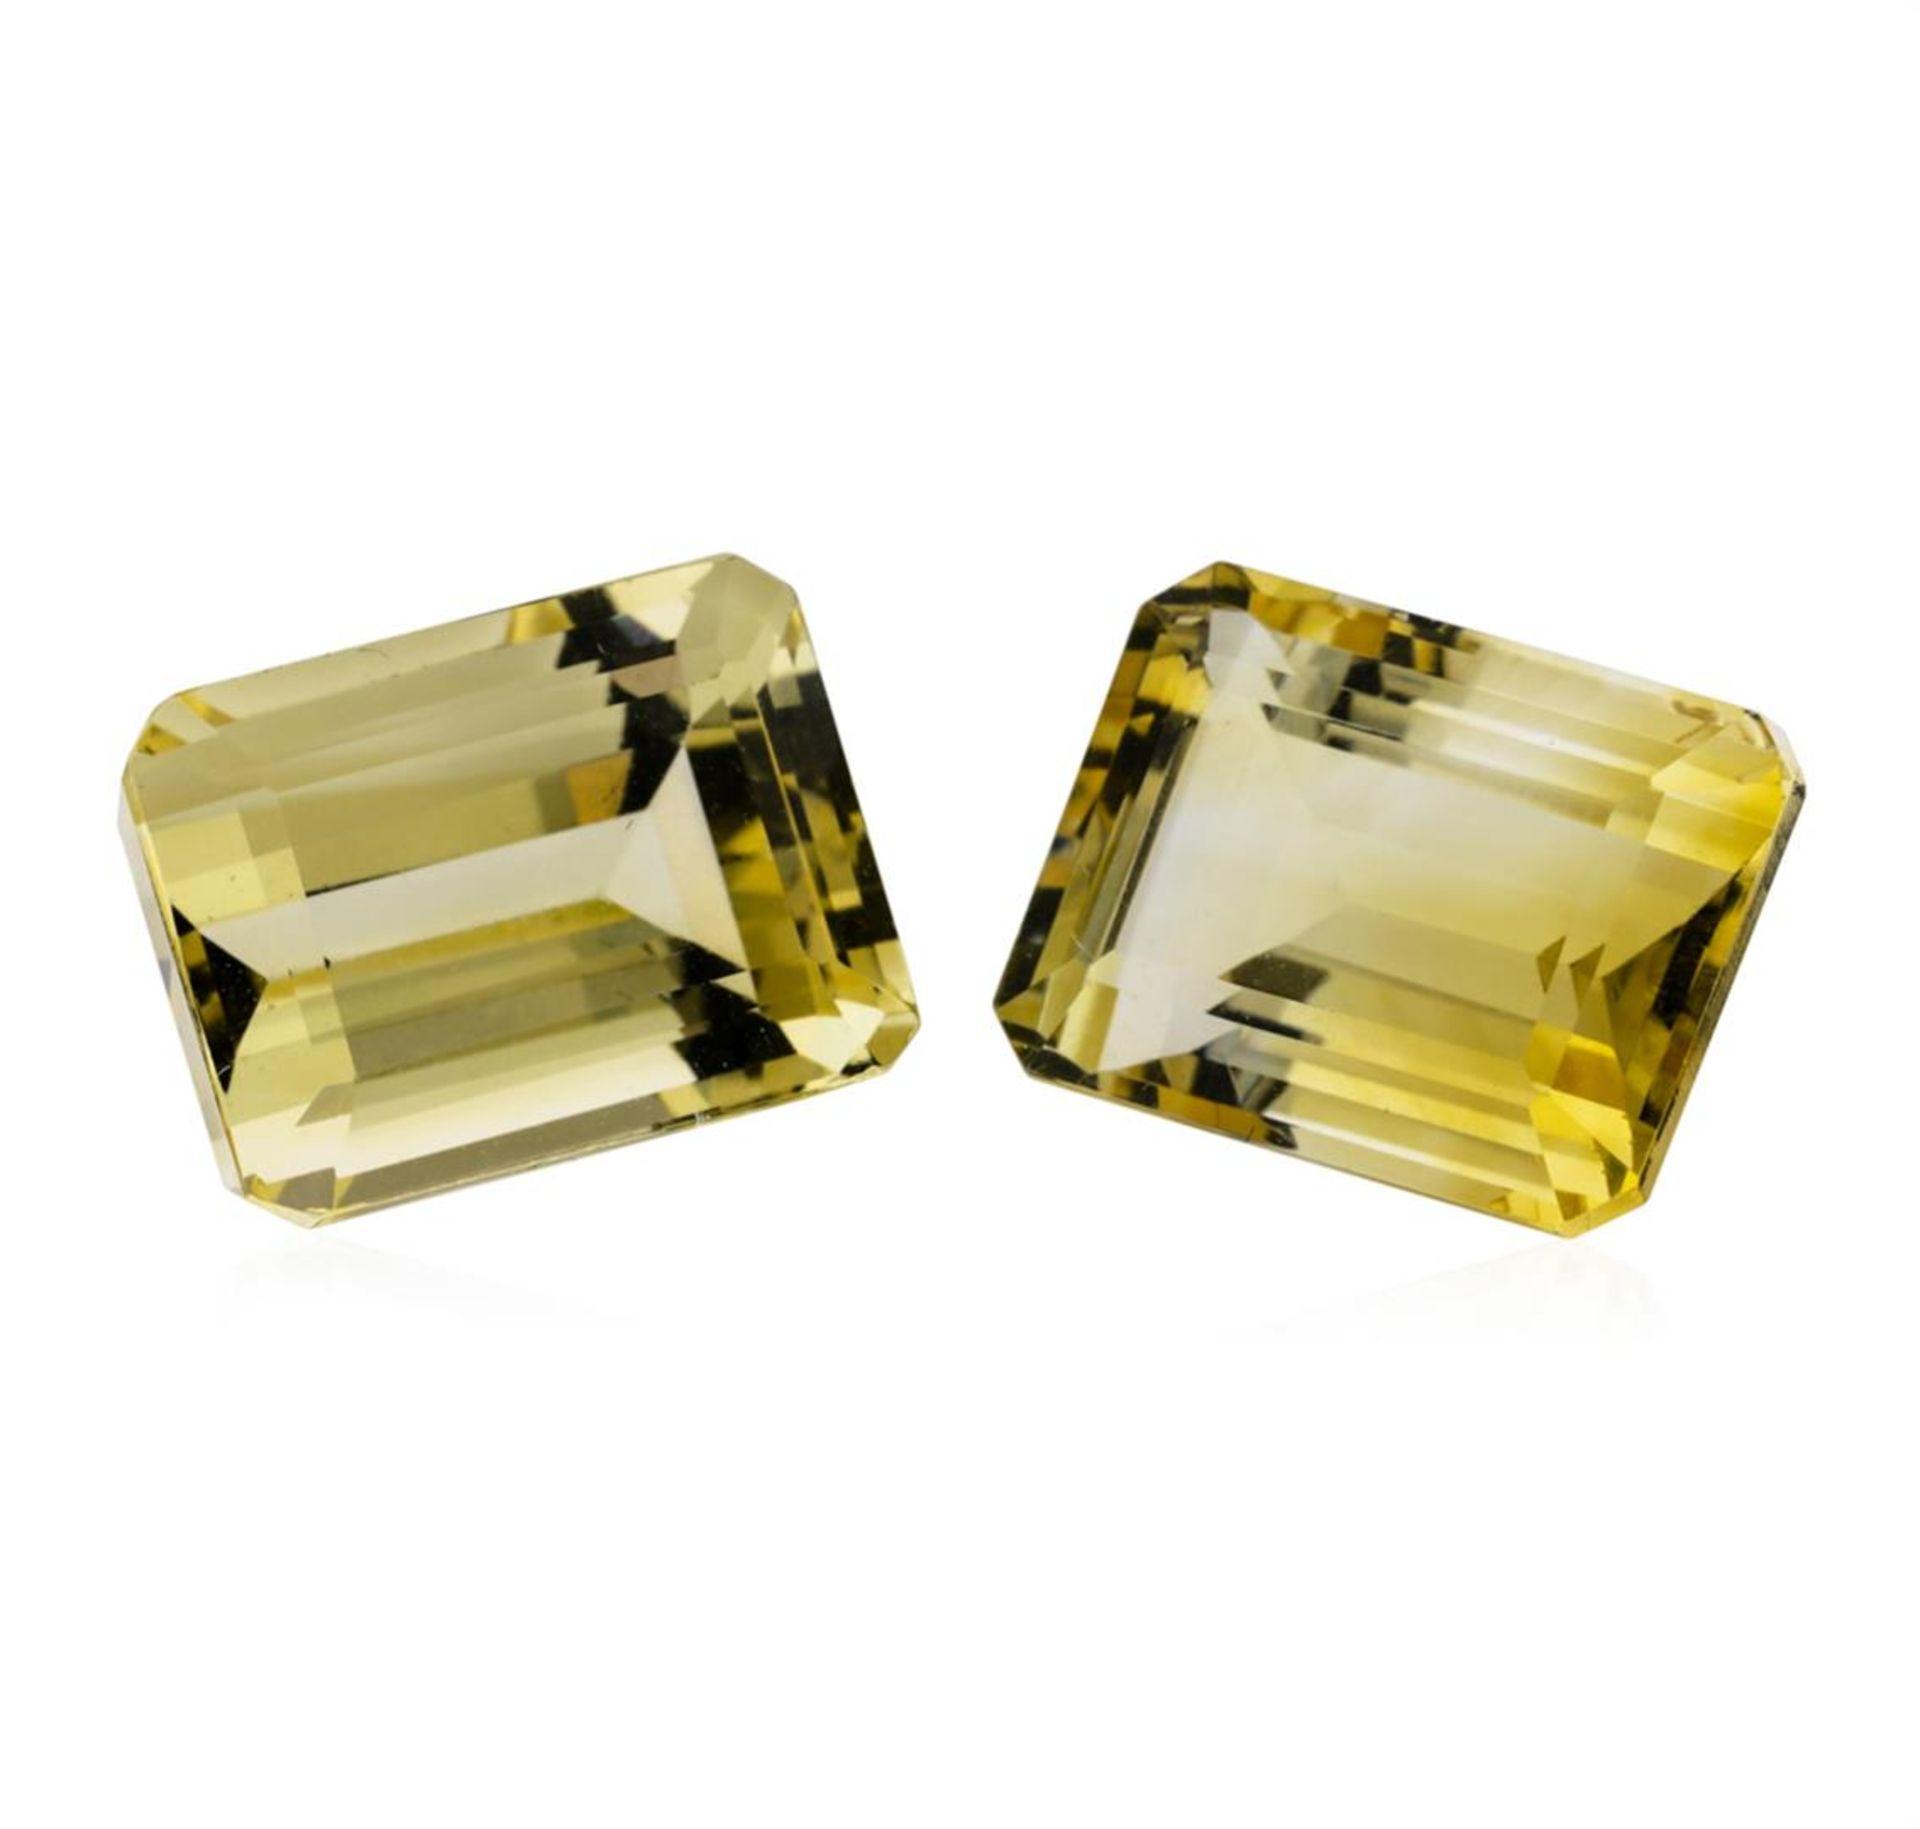 27.63ctw.Natural Emerald Cut Citrine Quartz Parcel of Two